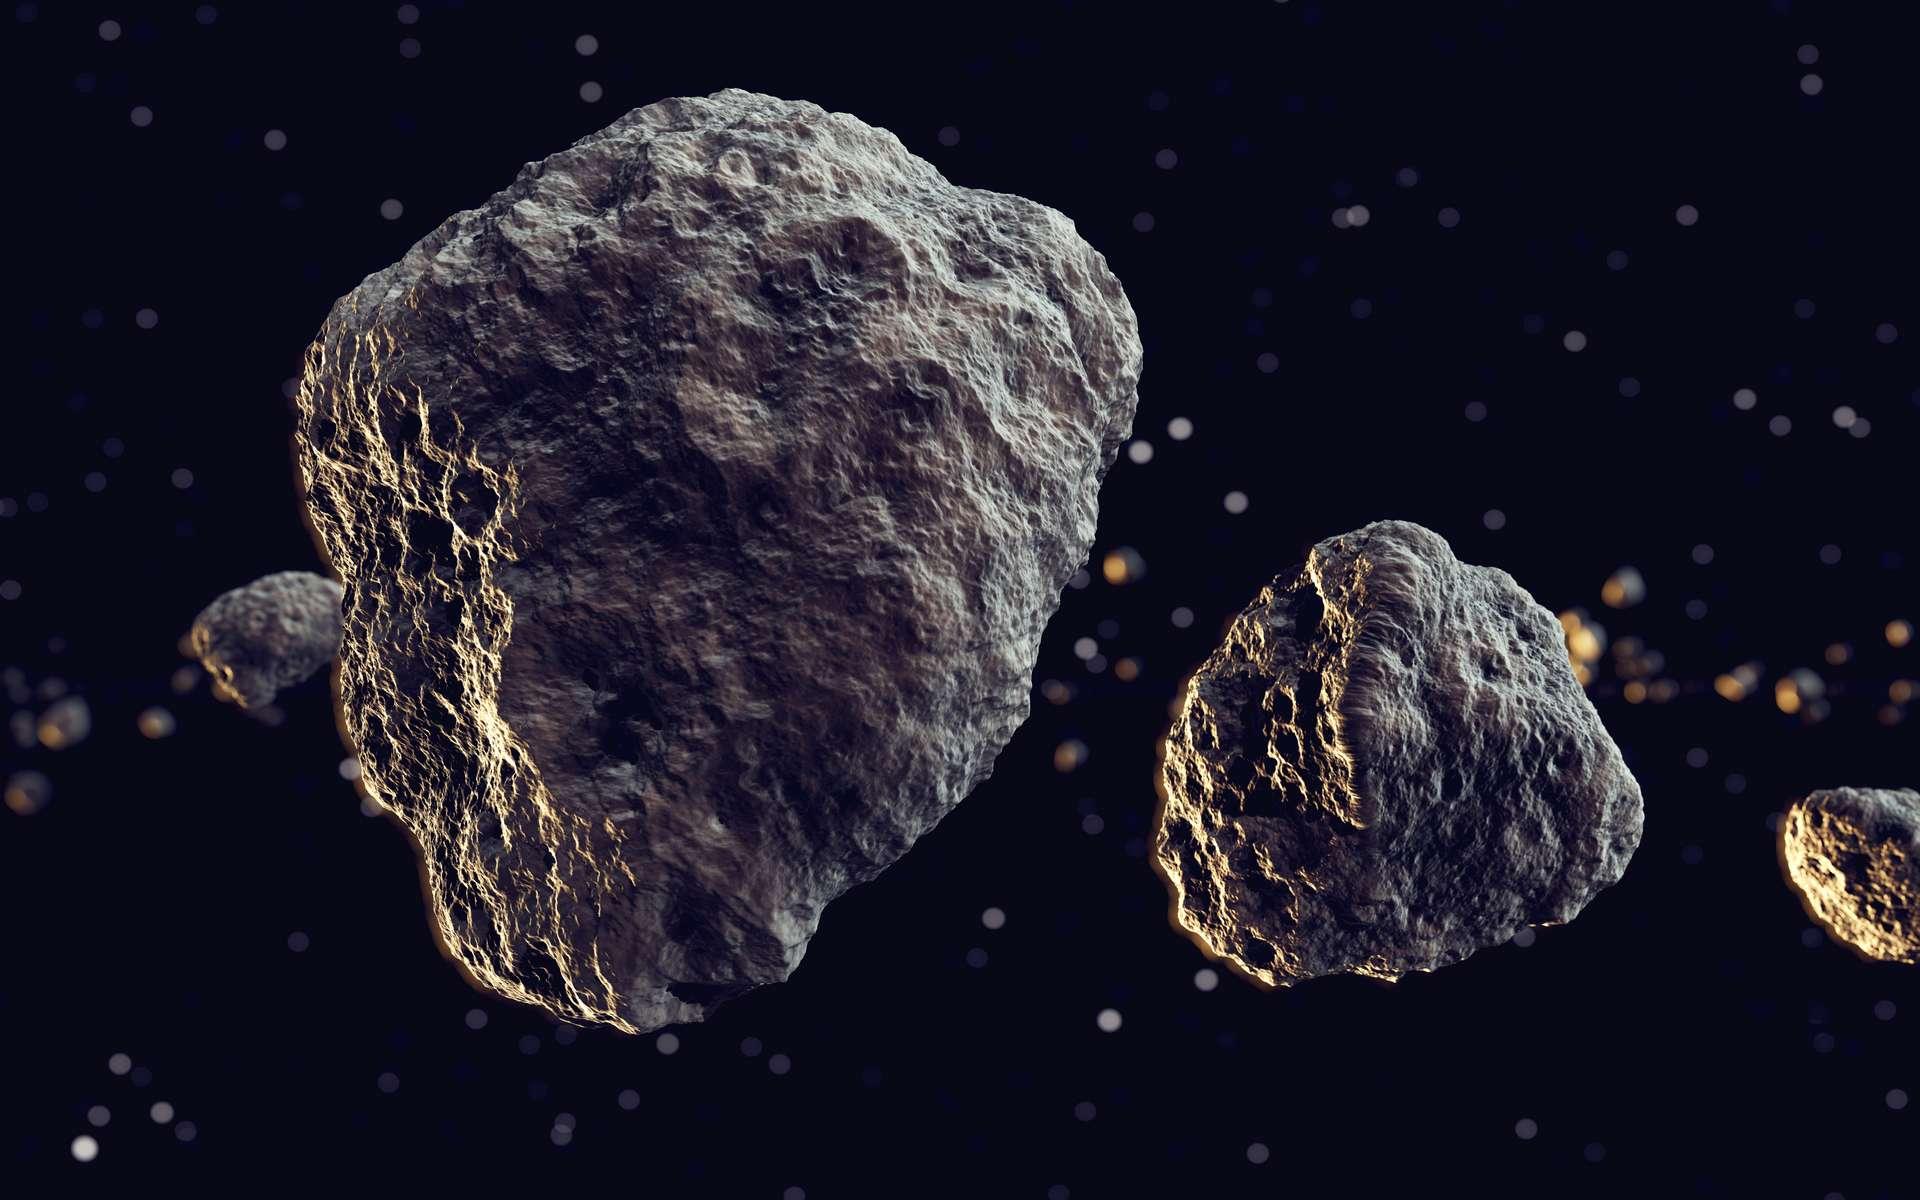 Illustration d'une météorite. © Dabarti, Adobe Stock